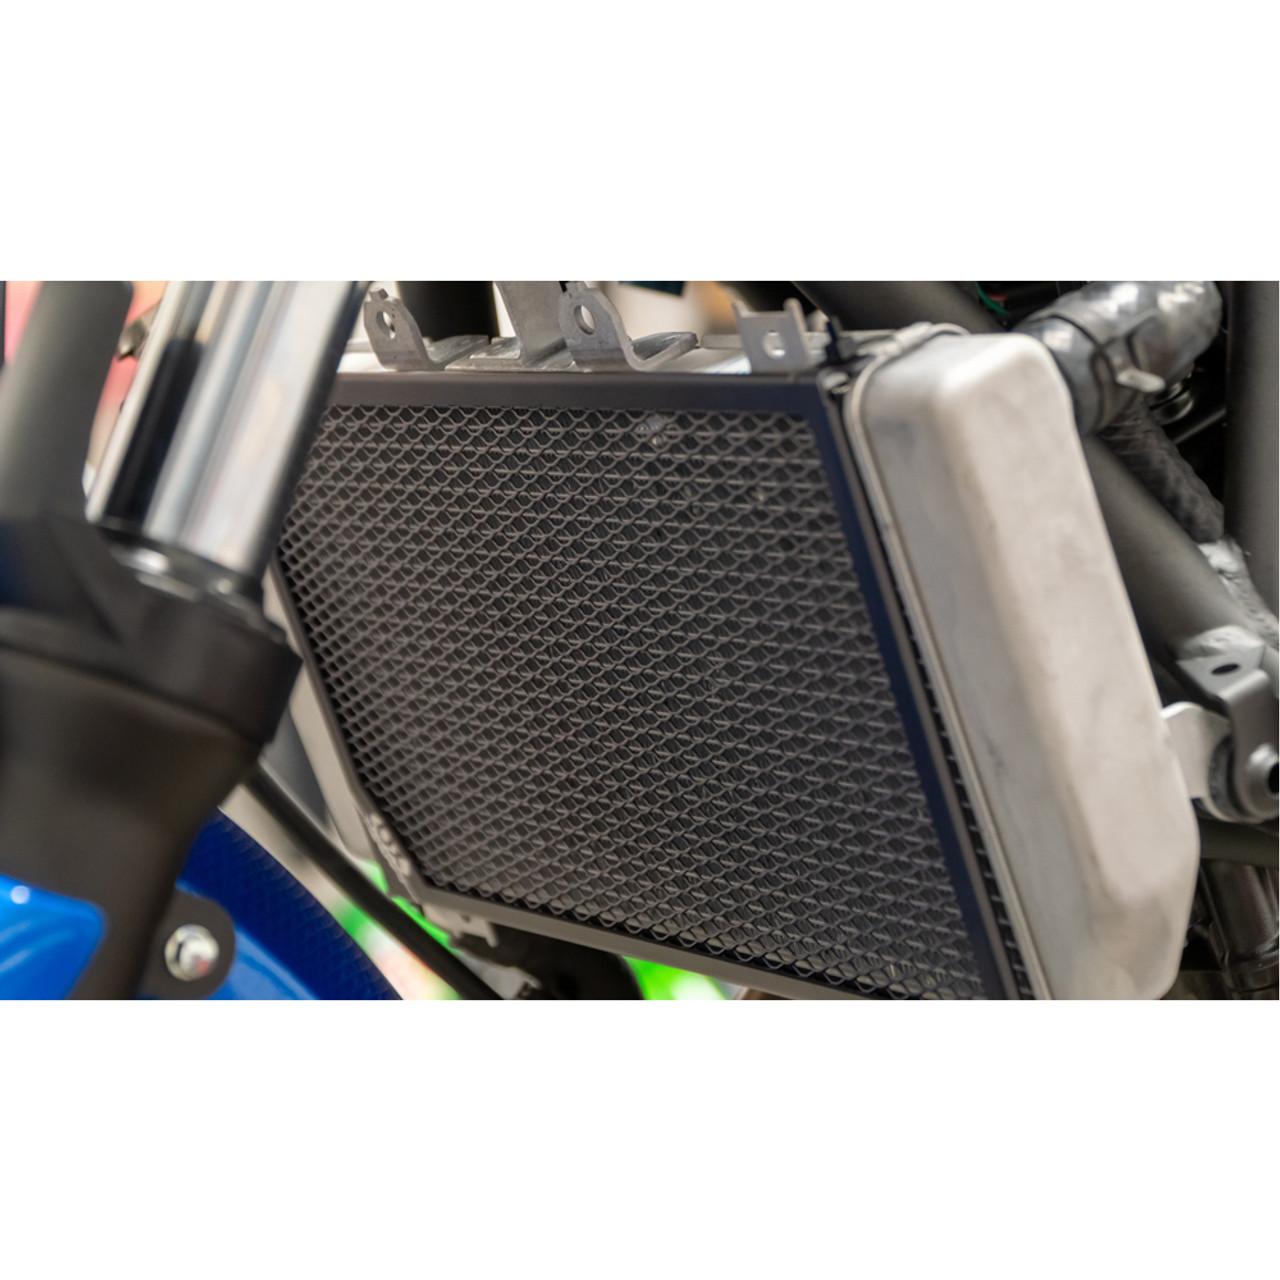 Broco Motorcycle Accessories Radiator Grille Guard Cover Protector for KAWASAKI NINJA 400 2018+